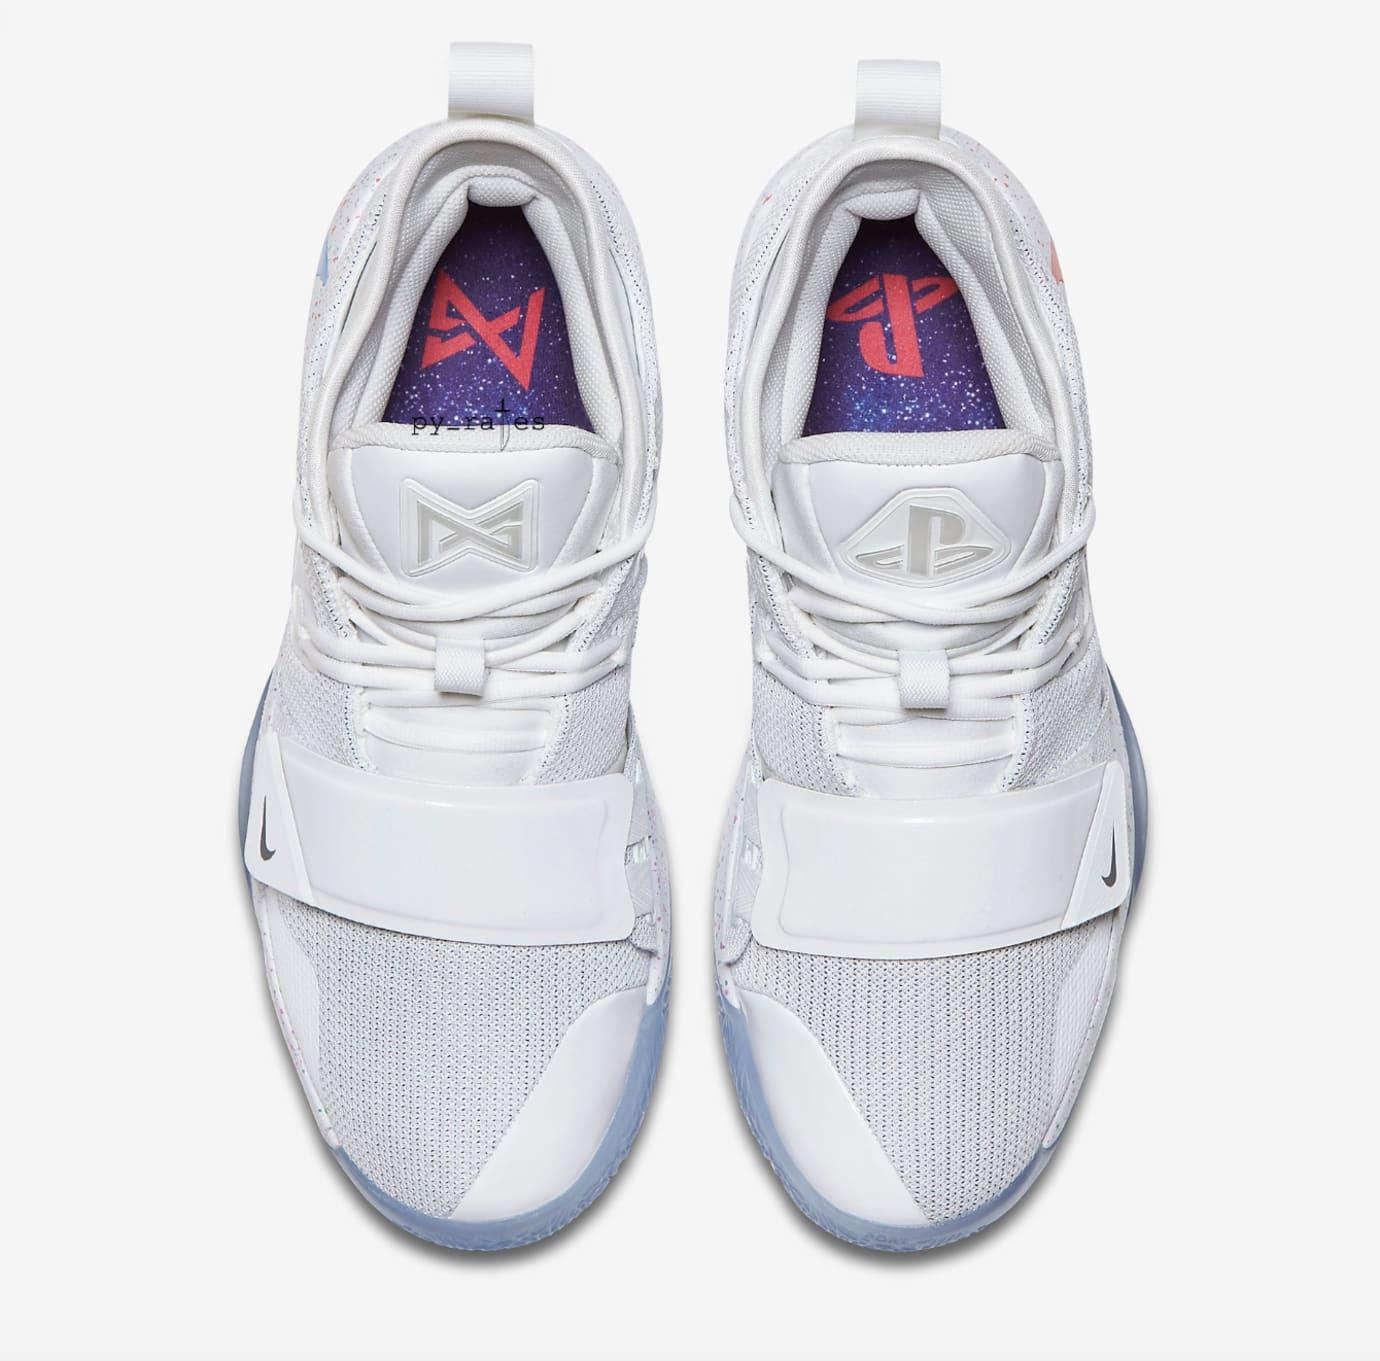 Nike PG 2.5 'Playstation' (Top)